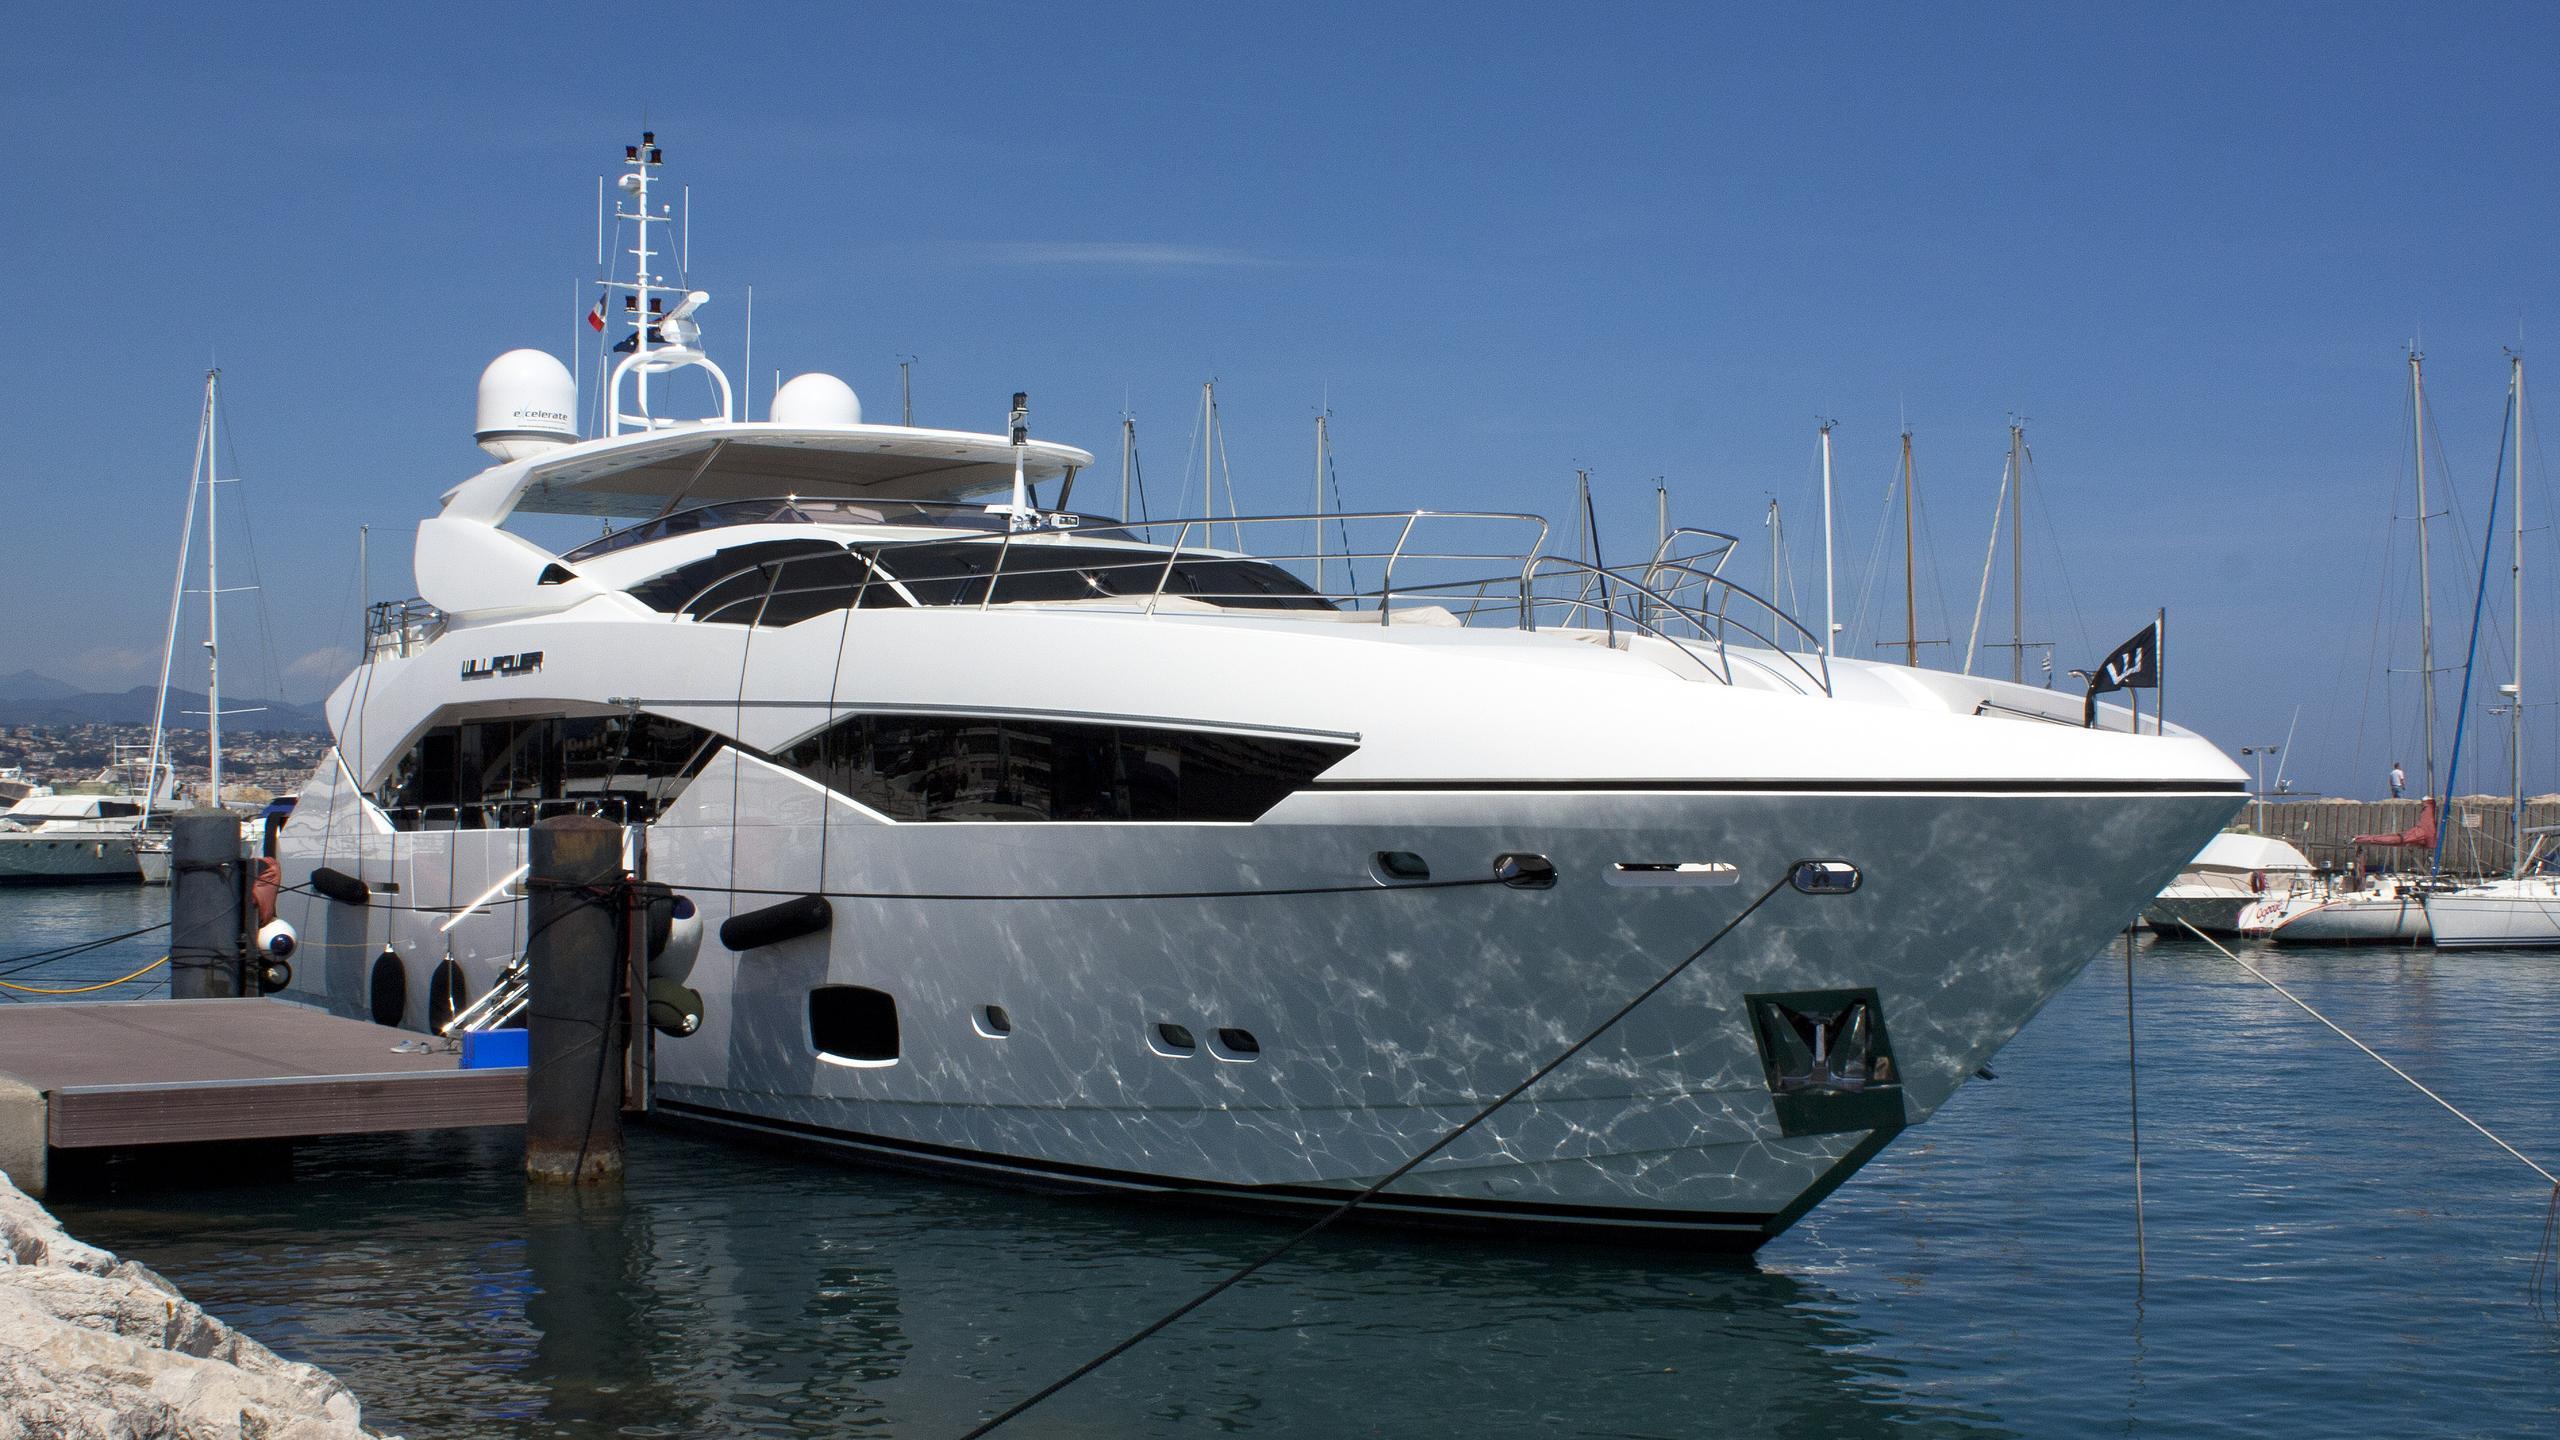 willpower-motor-yacht-sunseeker-2014-35m-half-profile